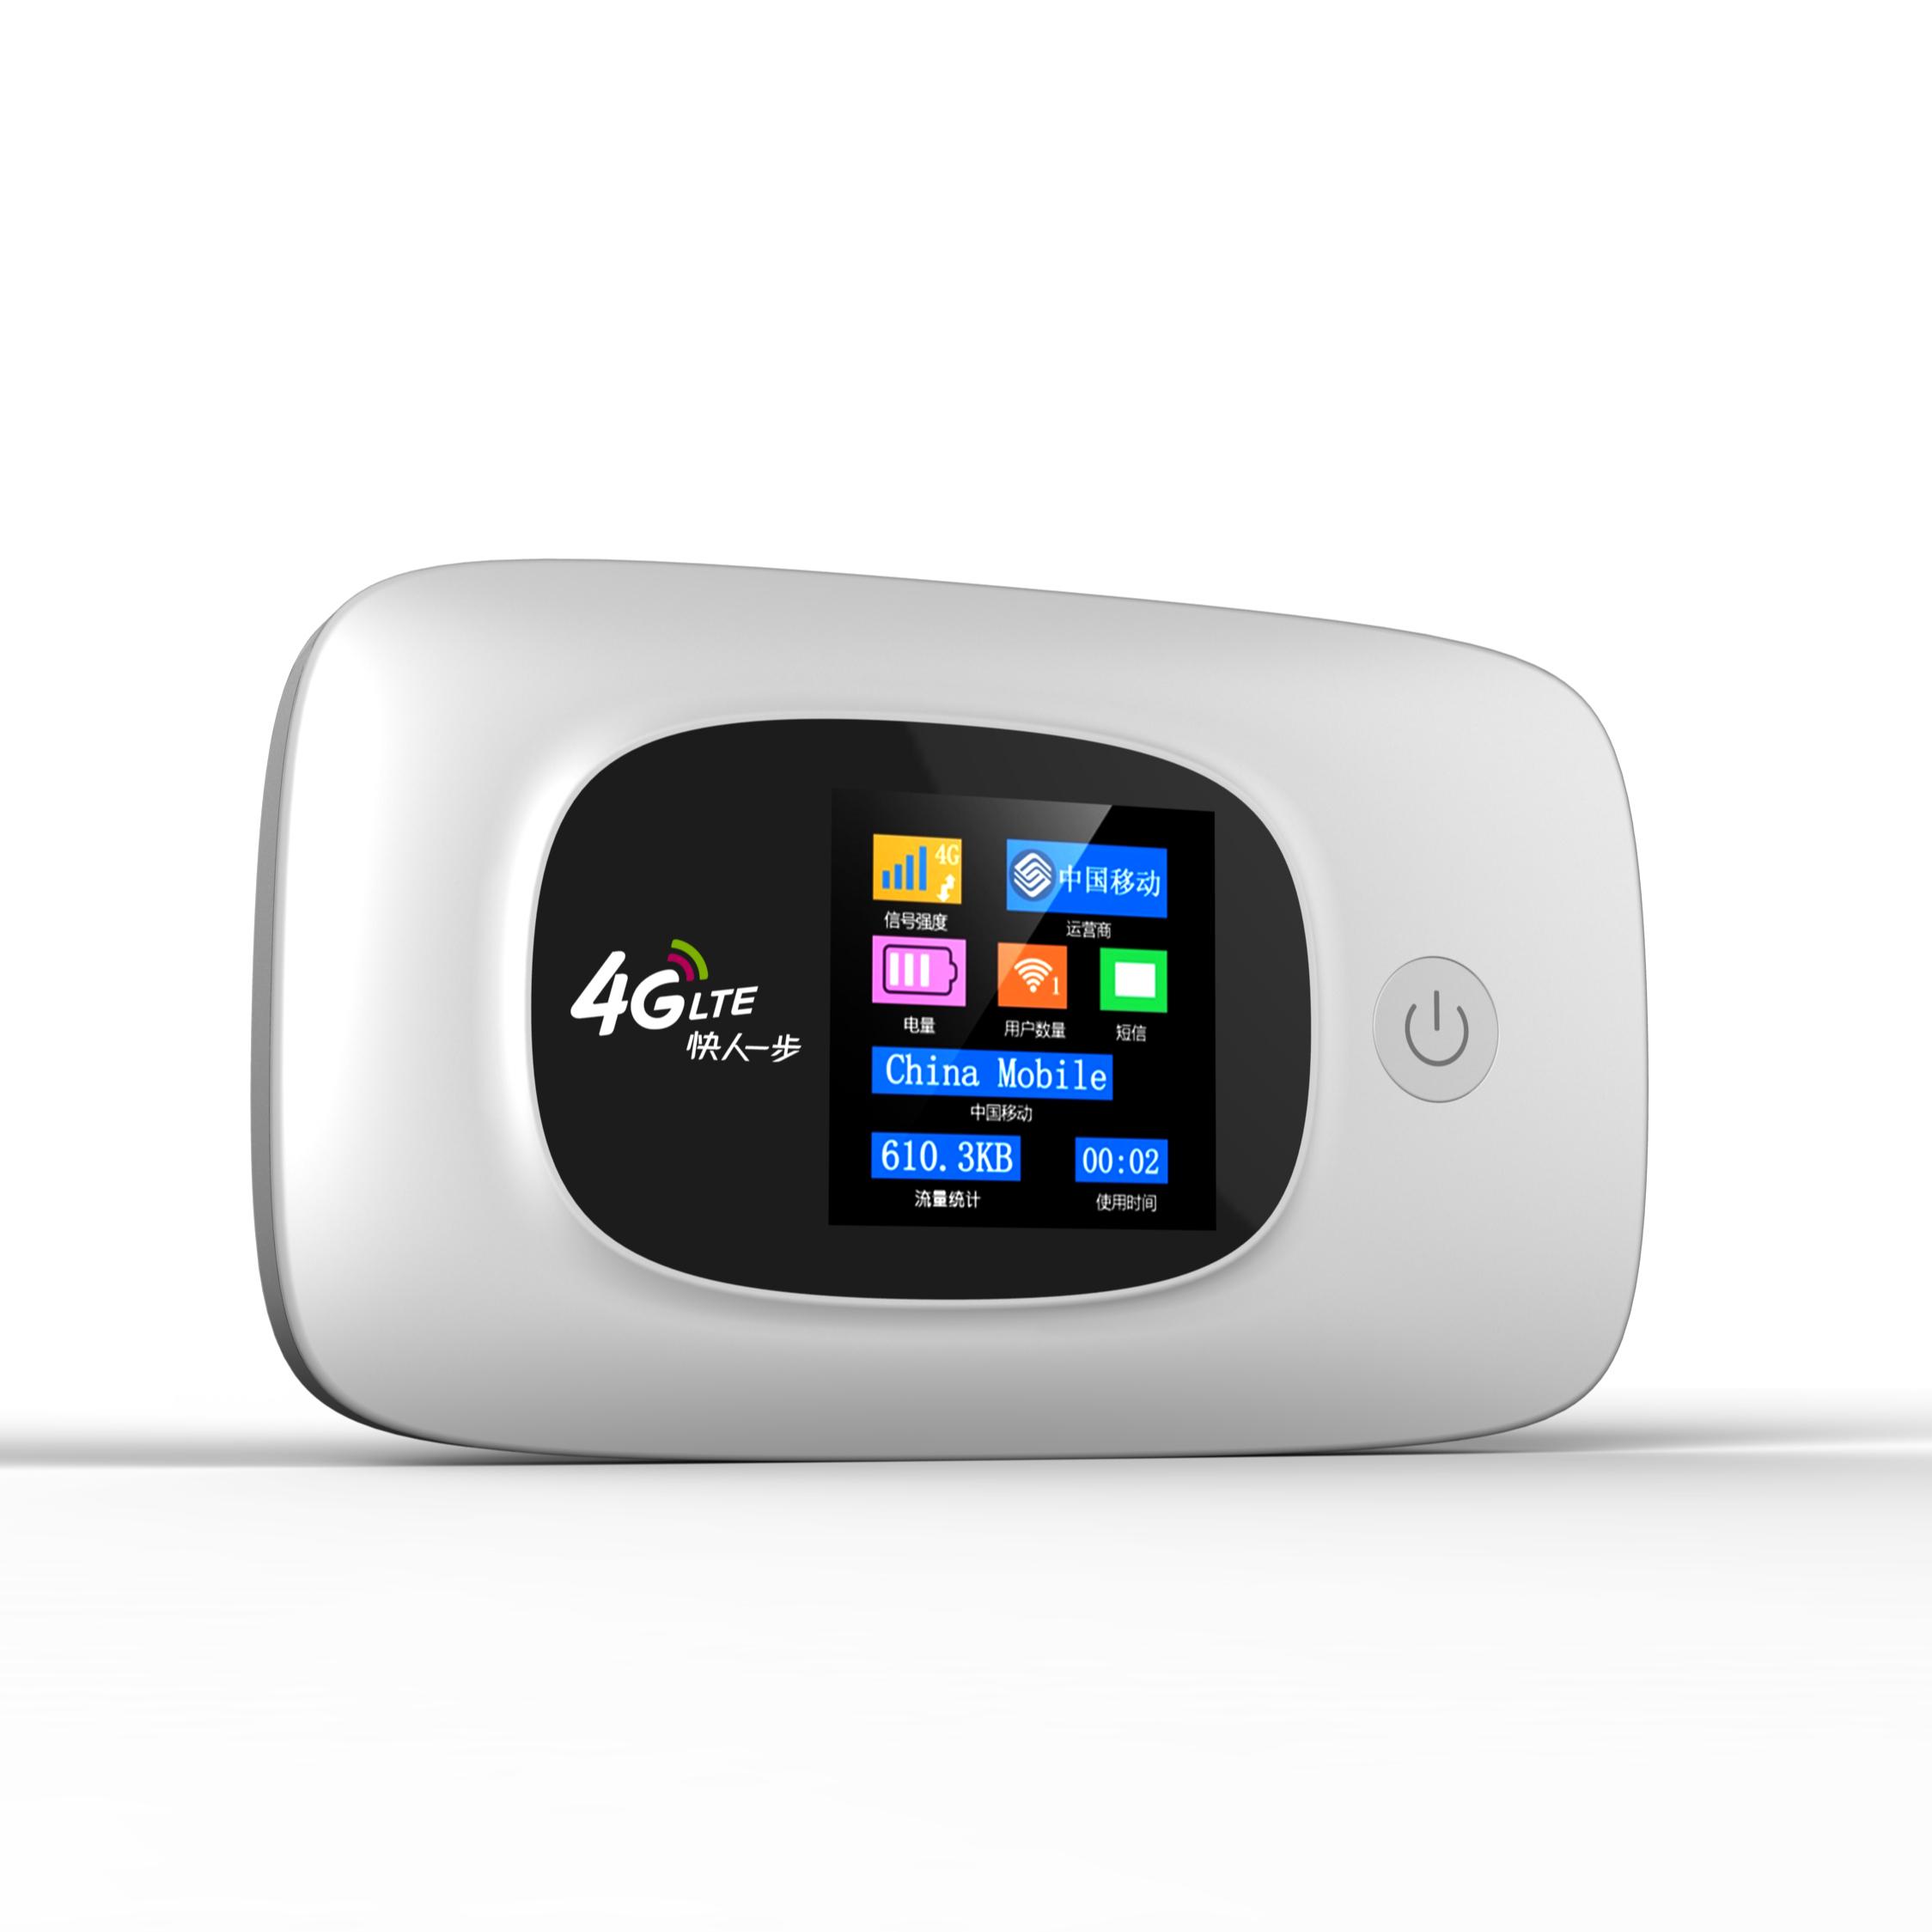 4G LTE واي فاي جيب نقطة ساخنة 2400 Mah راوتر 4G اللاسلكية المحمول Mifis